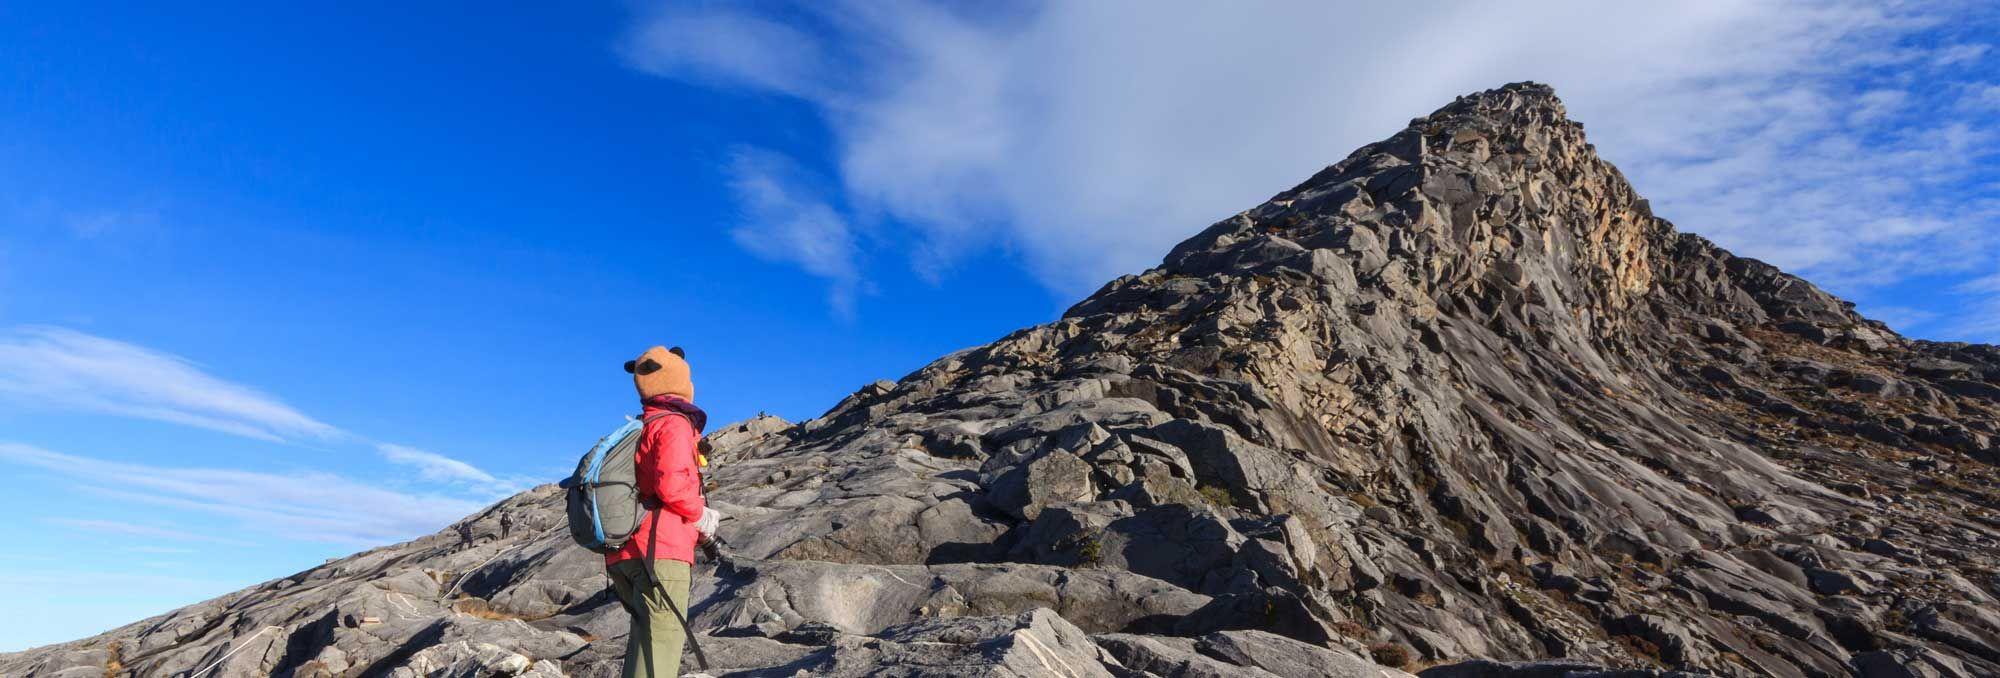 Mount Kinabalu Climb © Google Image